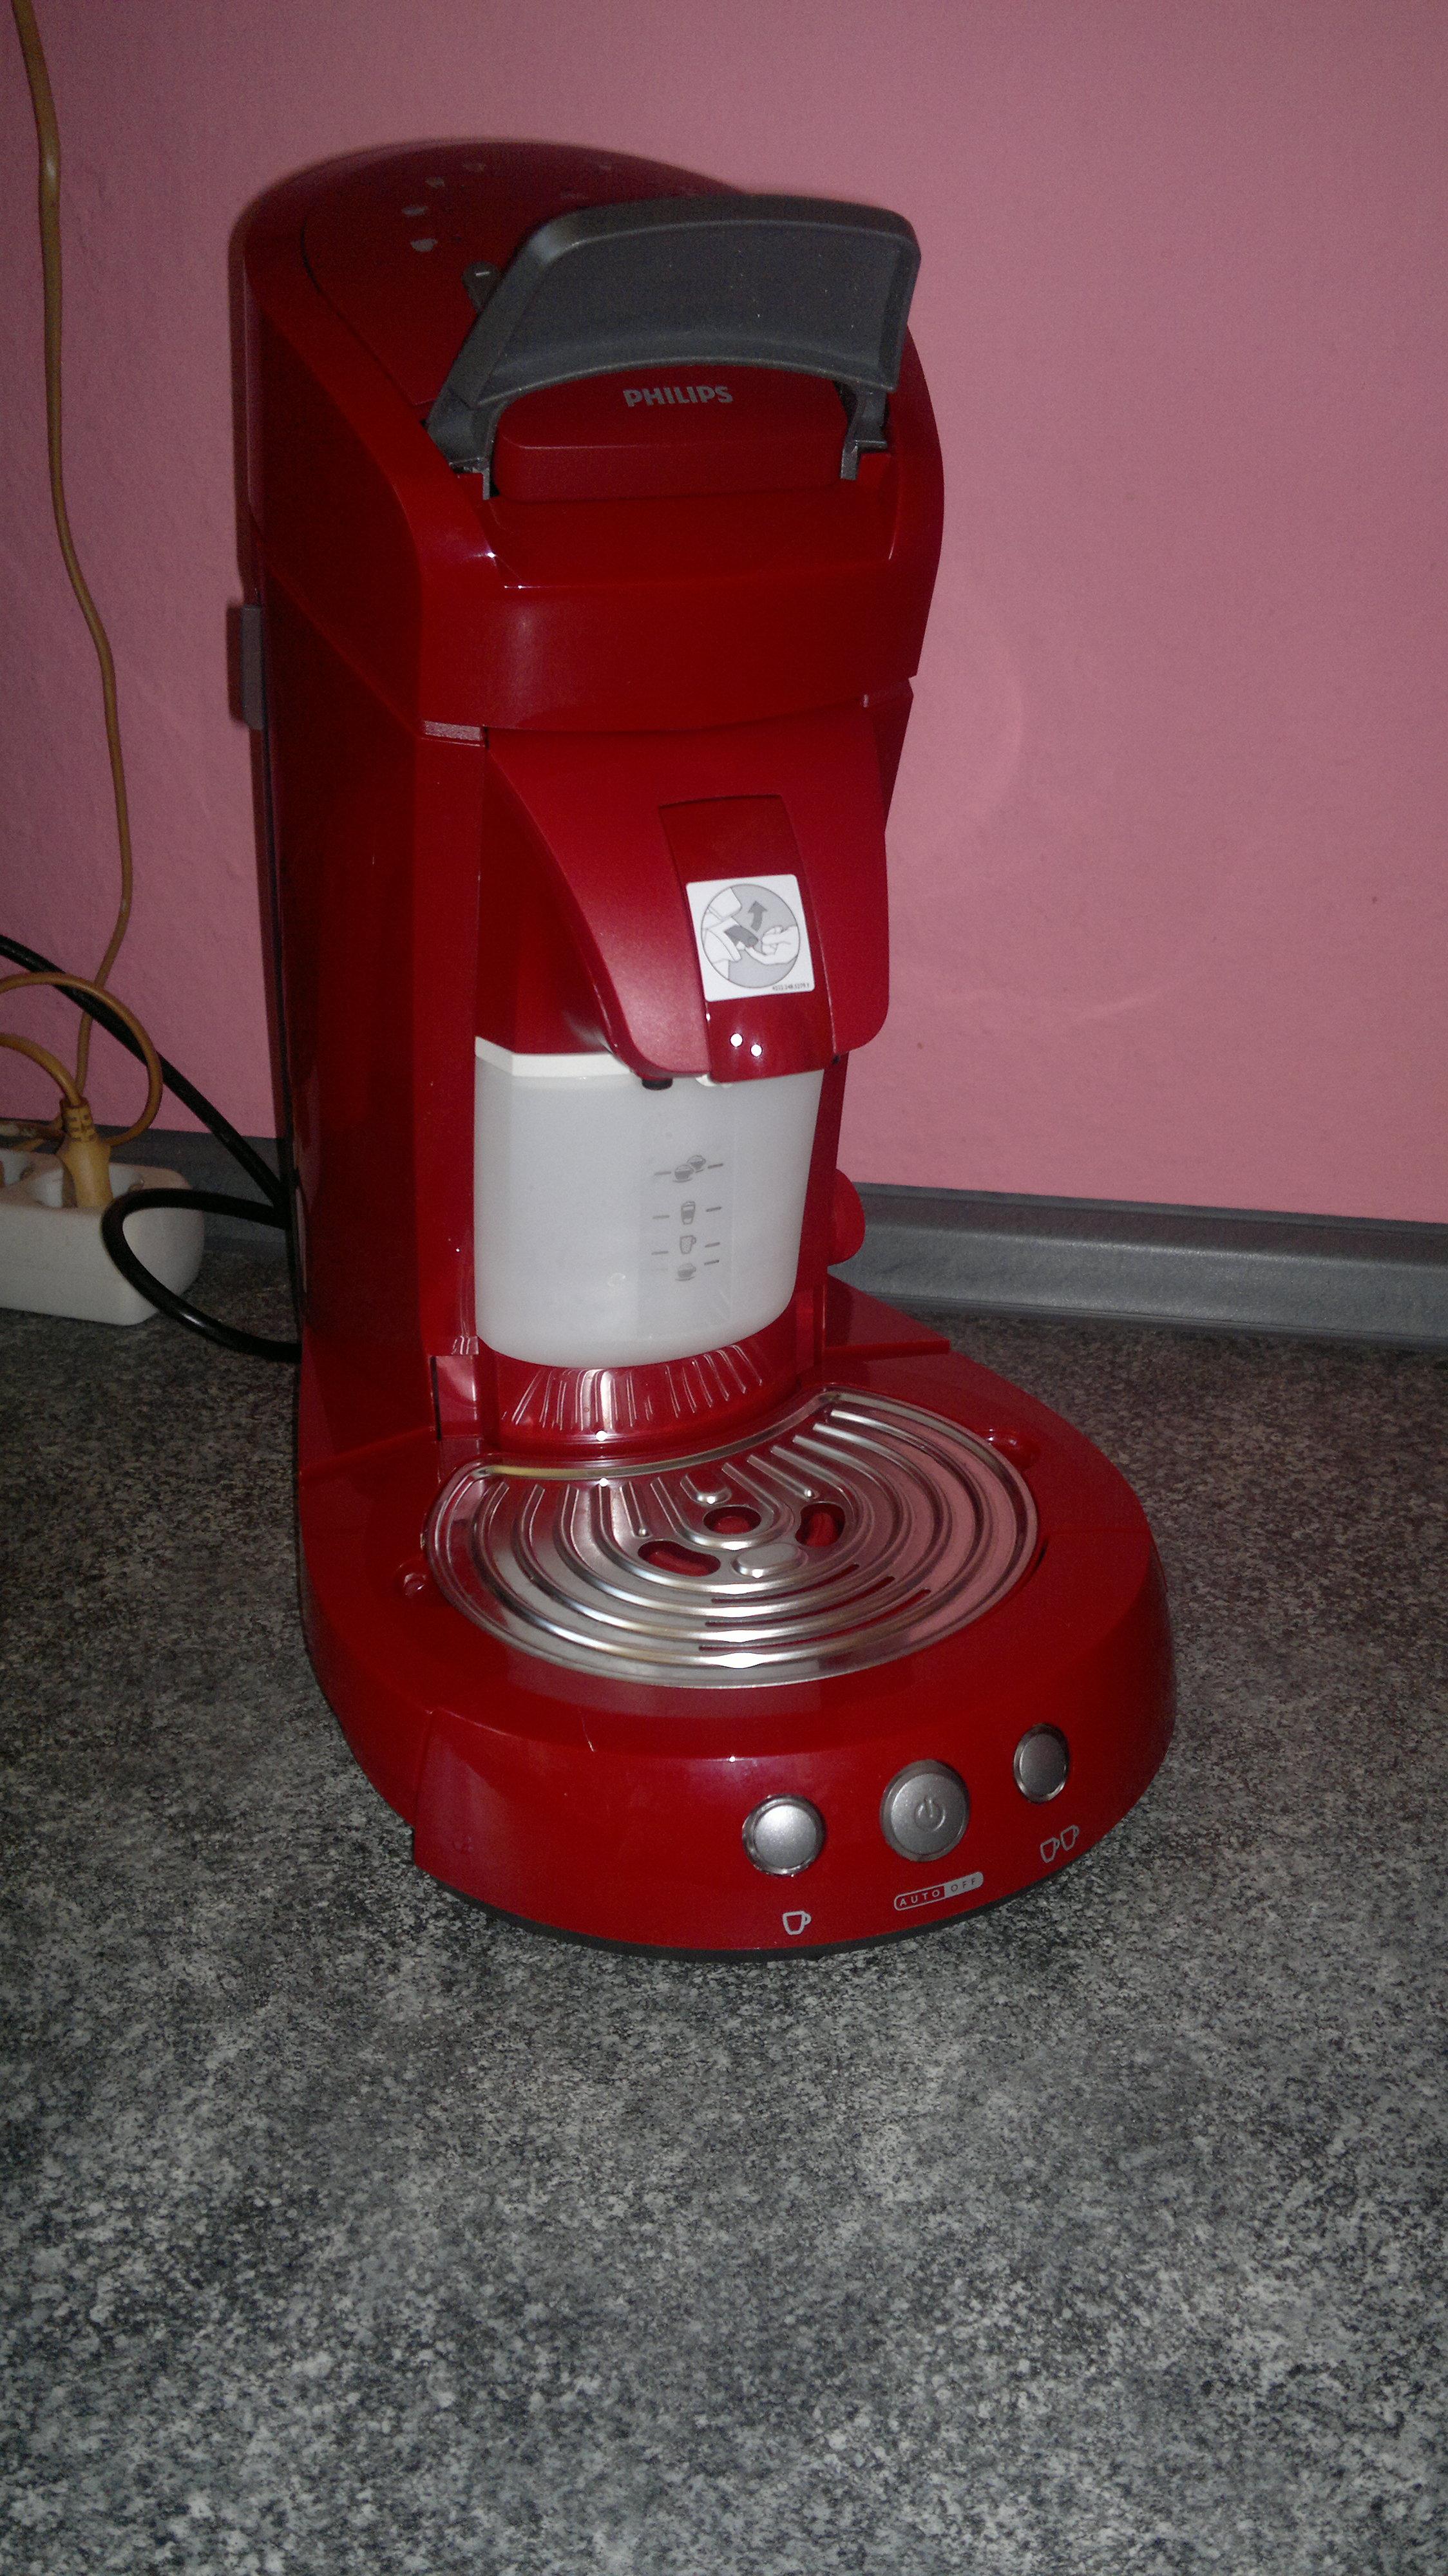 phillips hd 7854 80 senseo latte select rot kaffeemaschine kaffeeautomat goldiedaggi. Black Bedroom Furniture Sets. Home Design Ideas